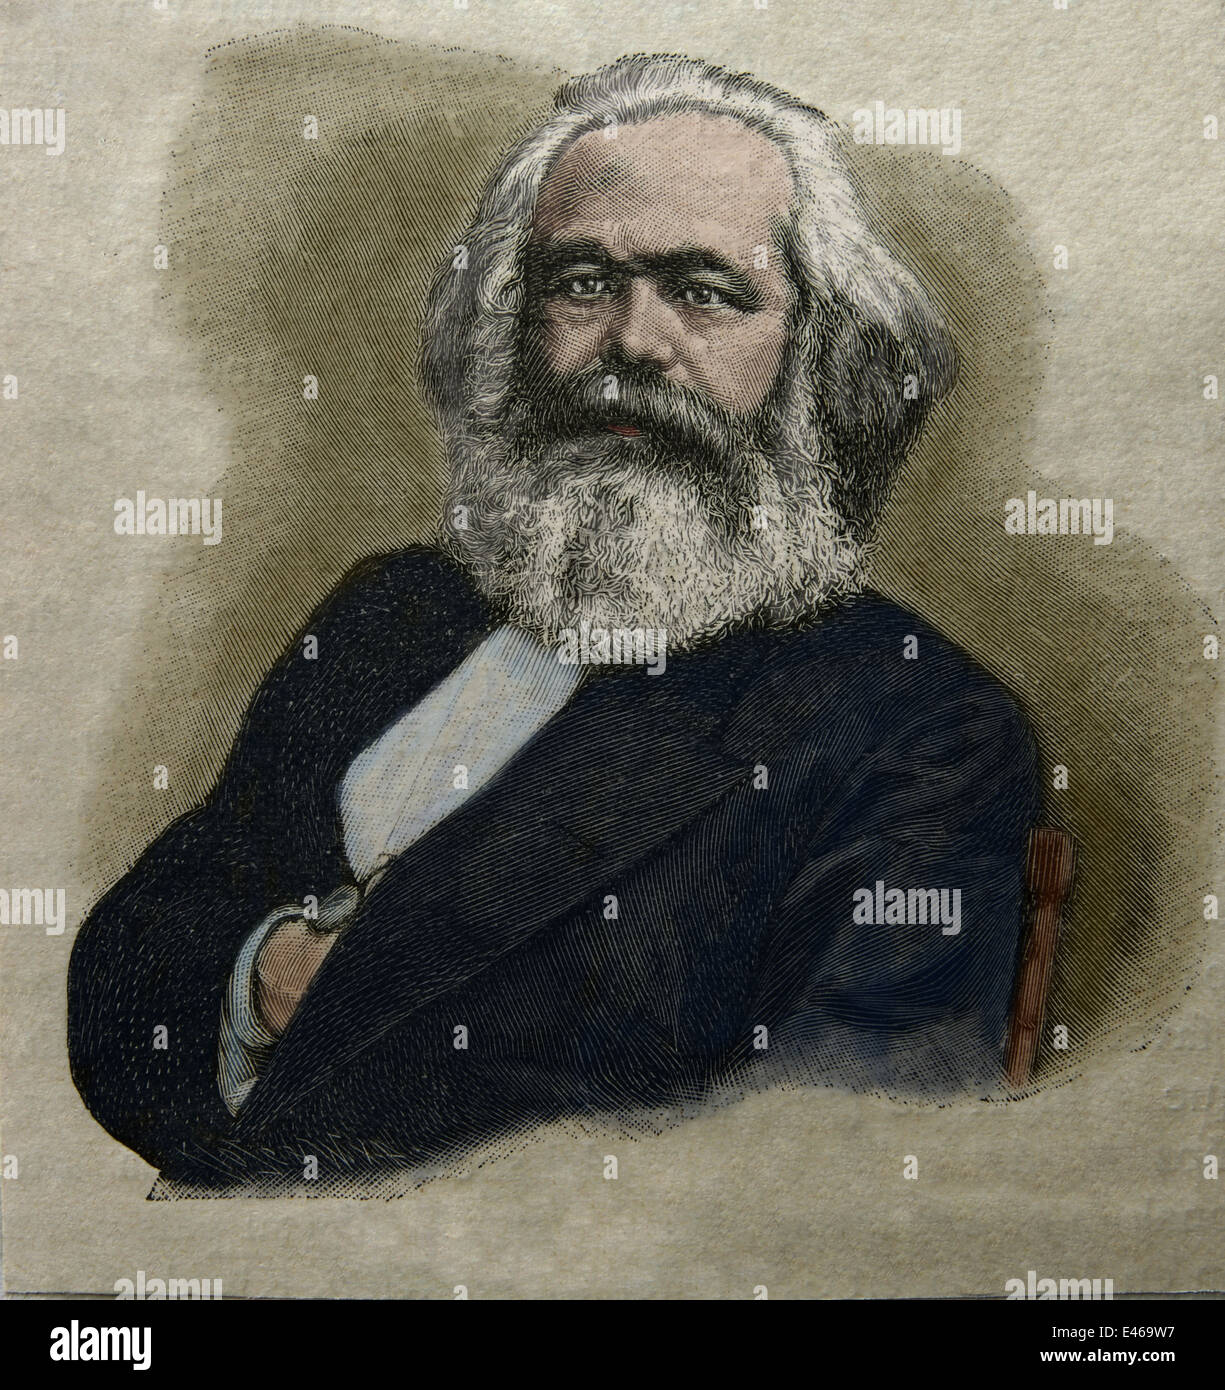 Karl Marx (1818-1883). German philosopher and revolutionary socialist. Portrait. Engraving. Color. - Stock Image